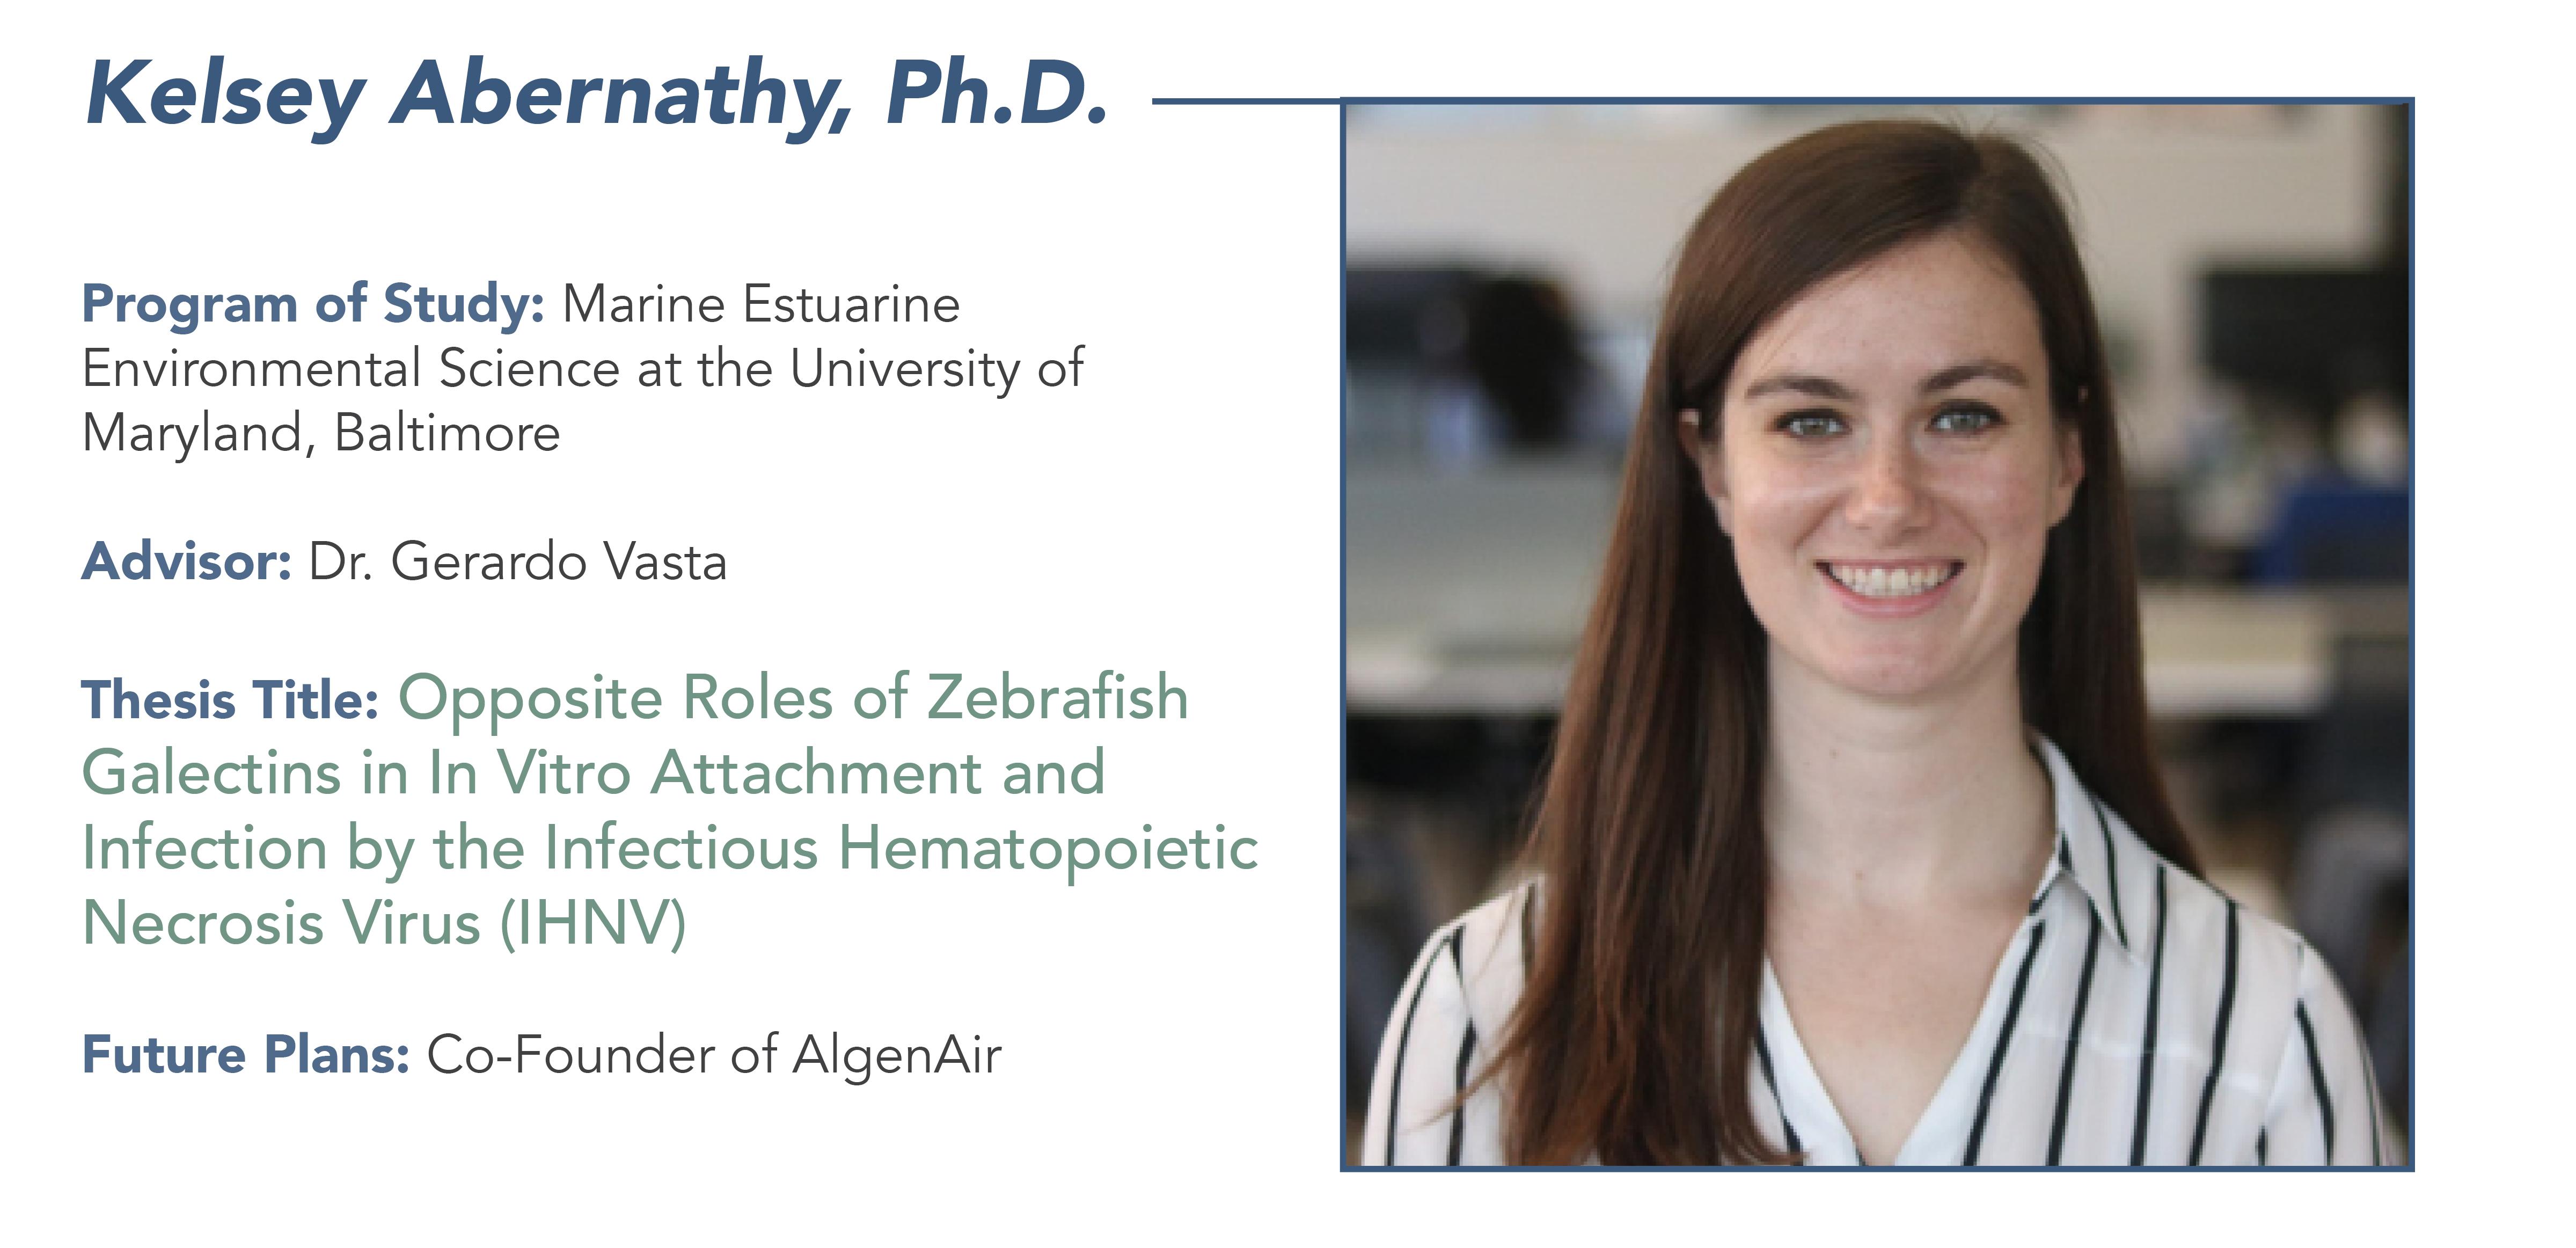 headshot of Kelsey Abernathy, Ph.D.